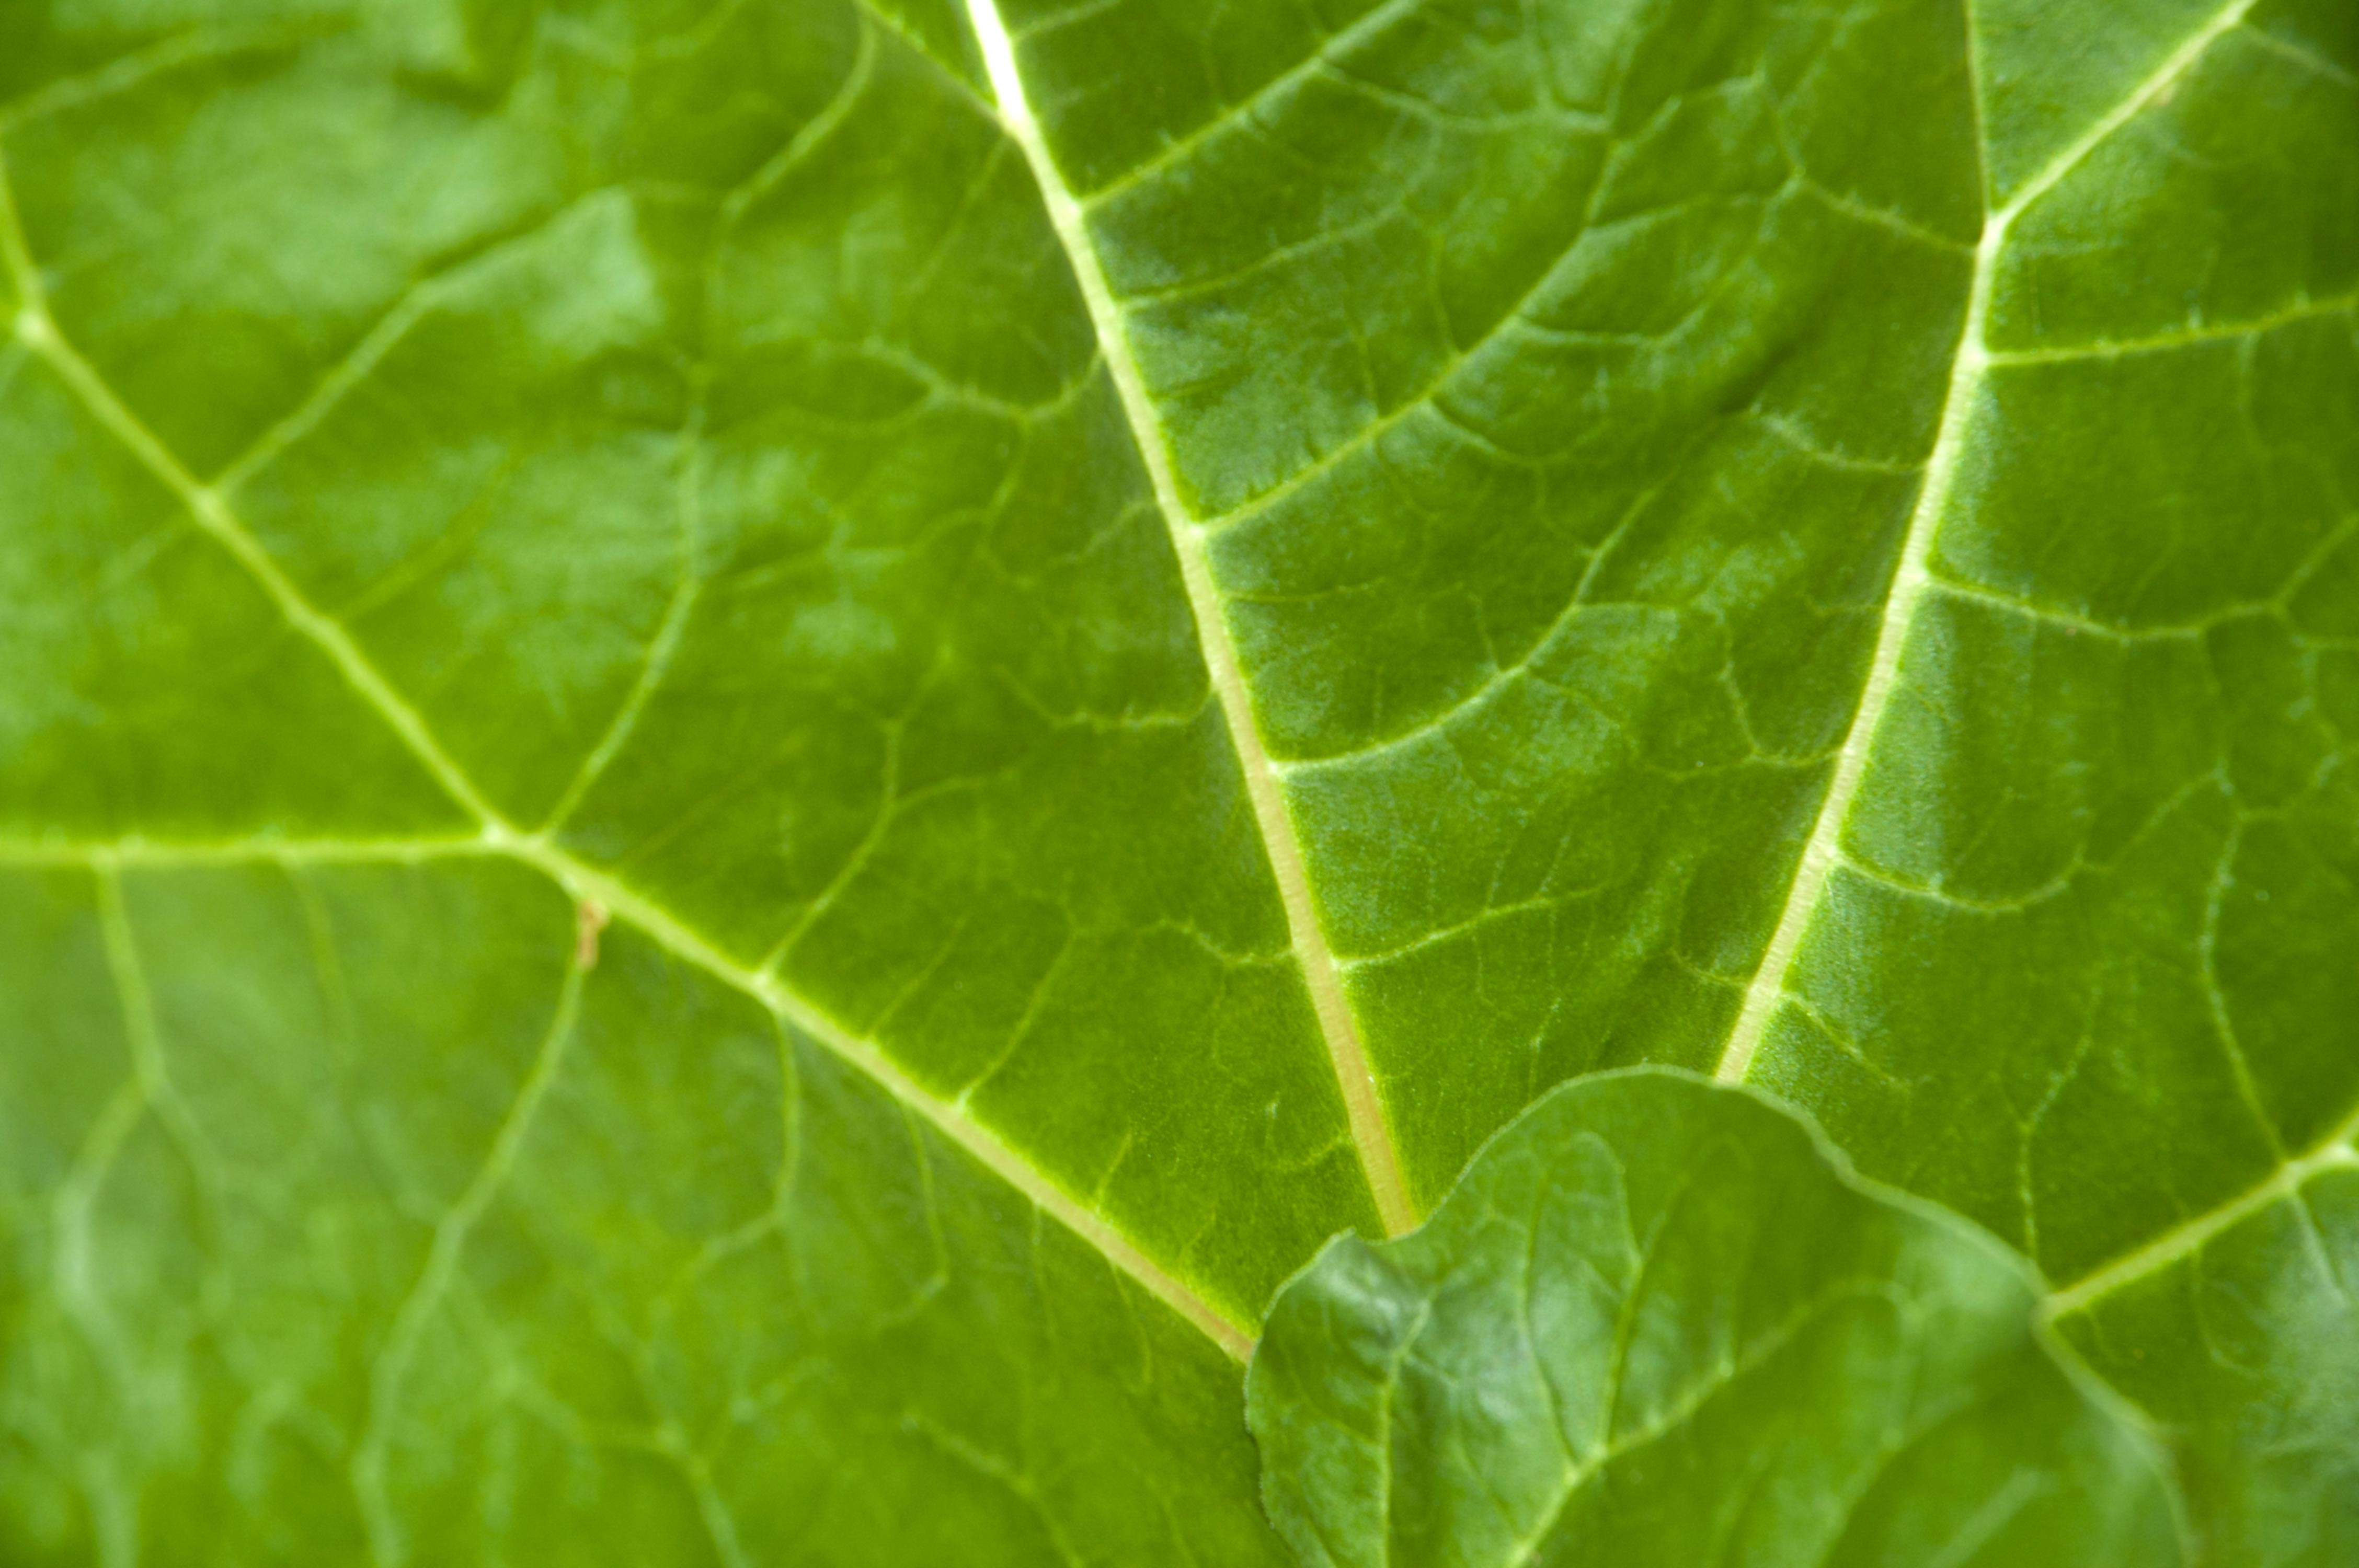 Big Green Leaf Background